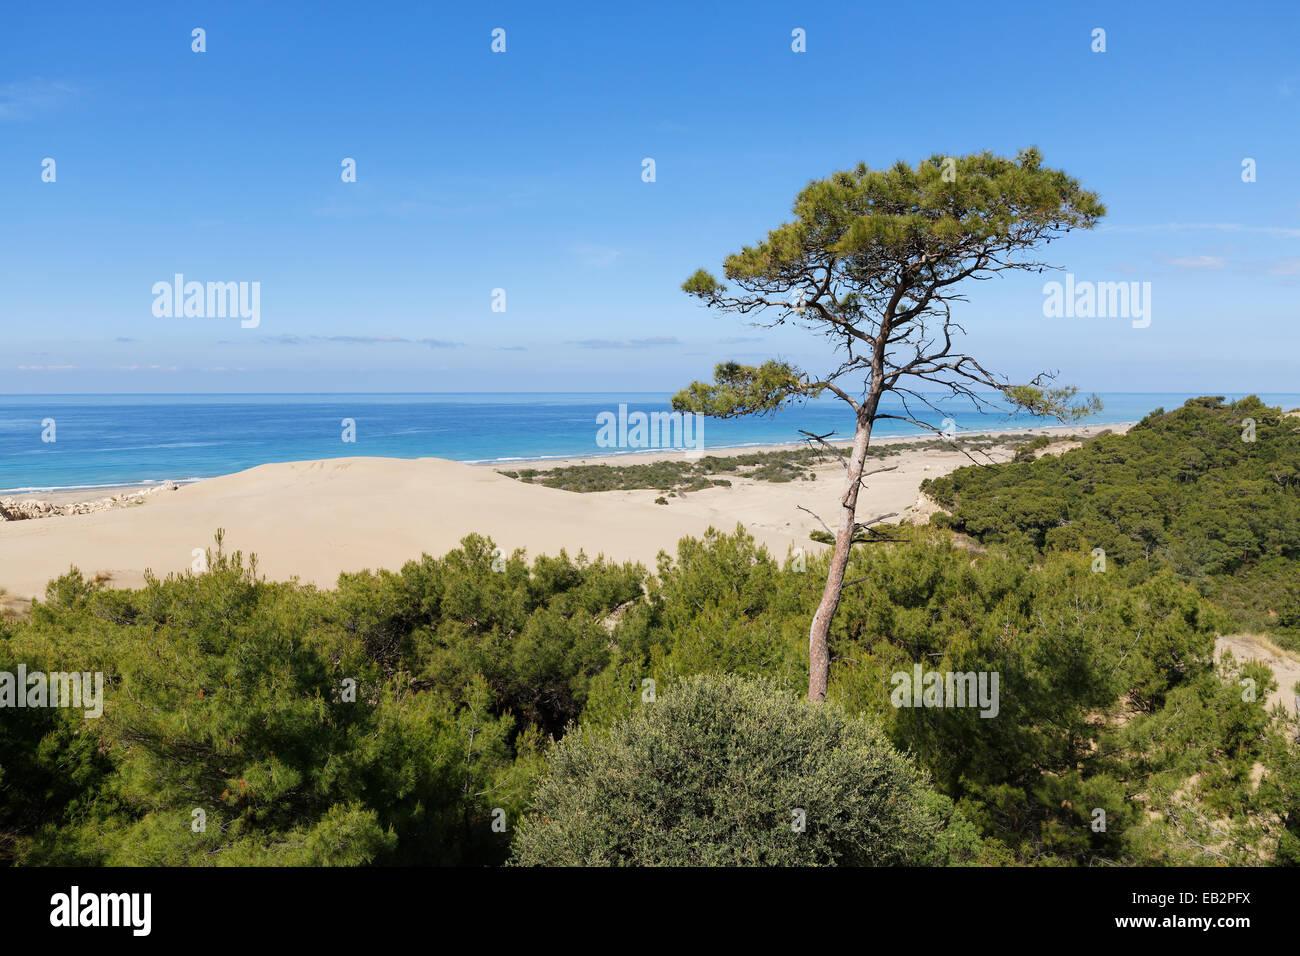 Pine tree on sand dunes, Lycian coast, Gelemiş, Mediterranean Region, Turkey - Stock Image